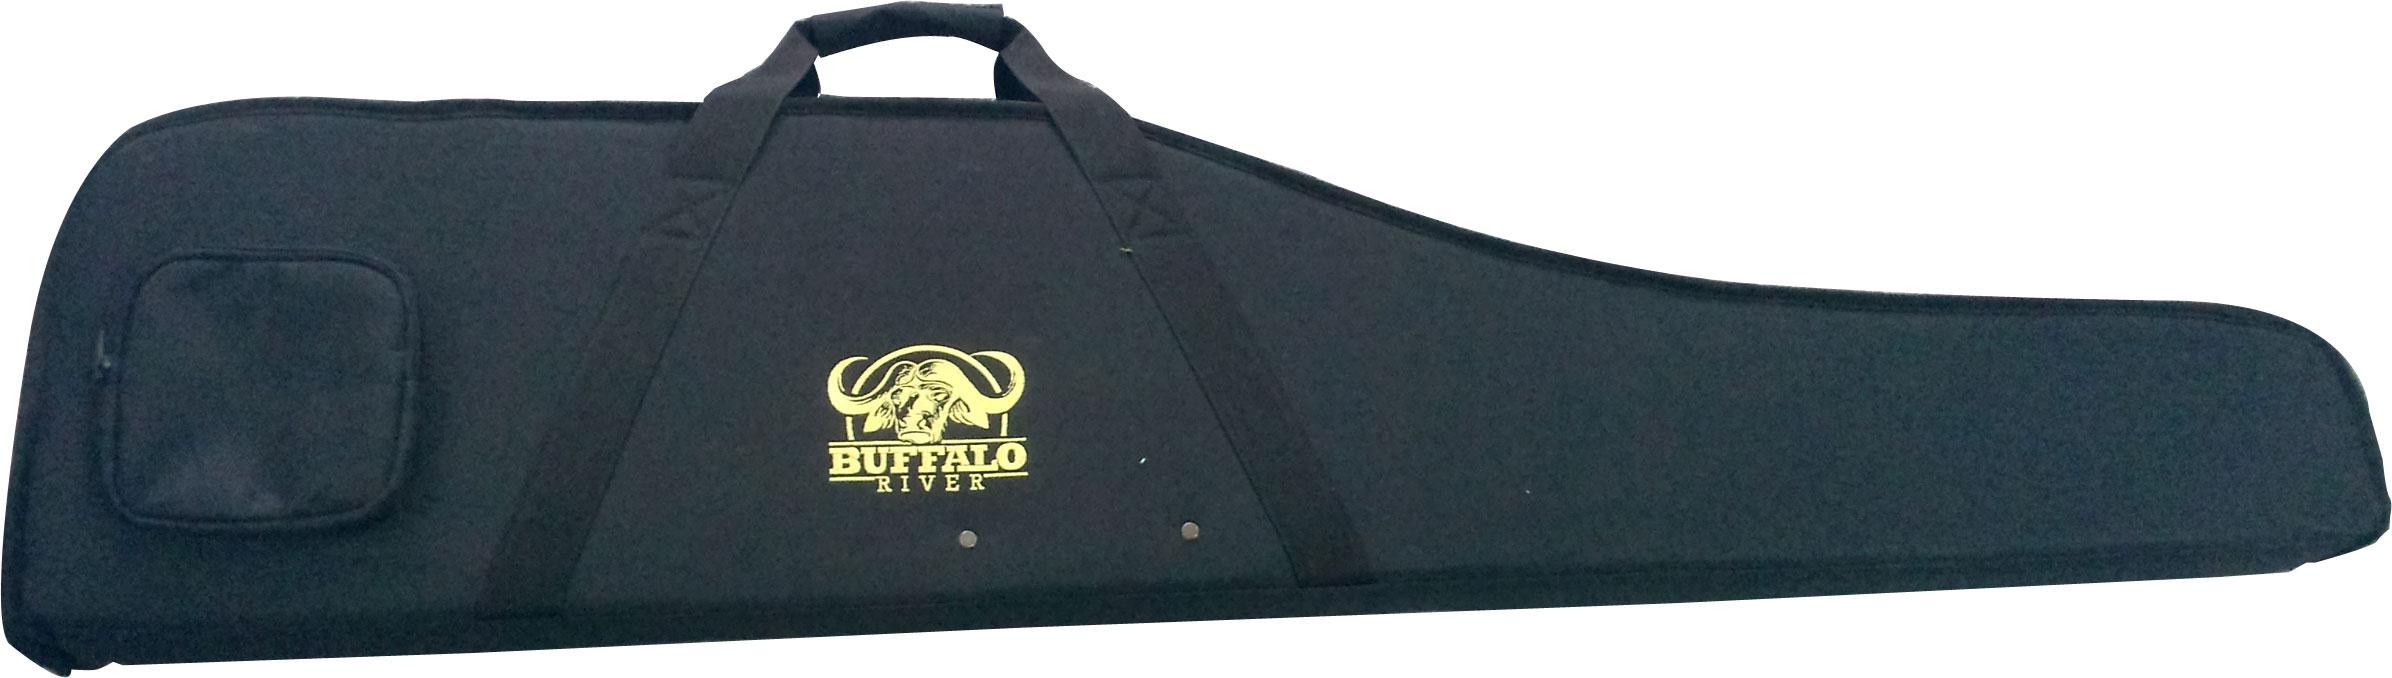 Funda Buffalo River Rifle Man negro